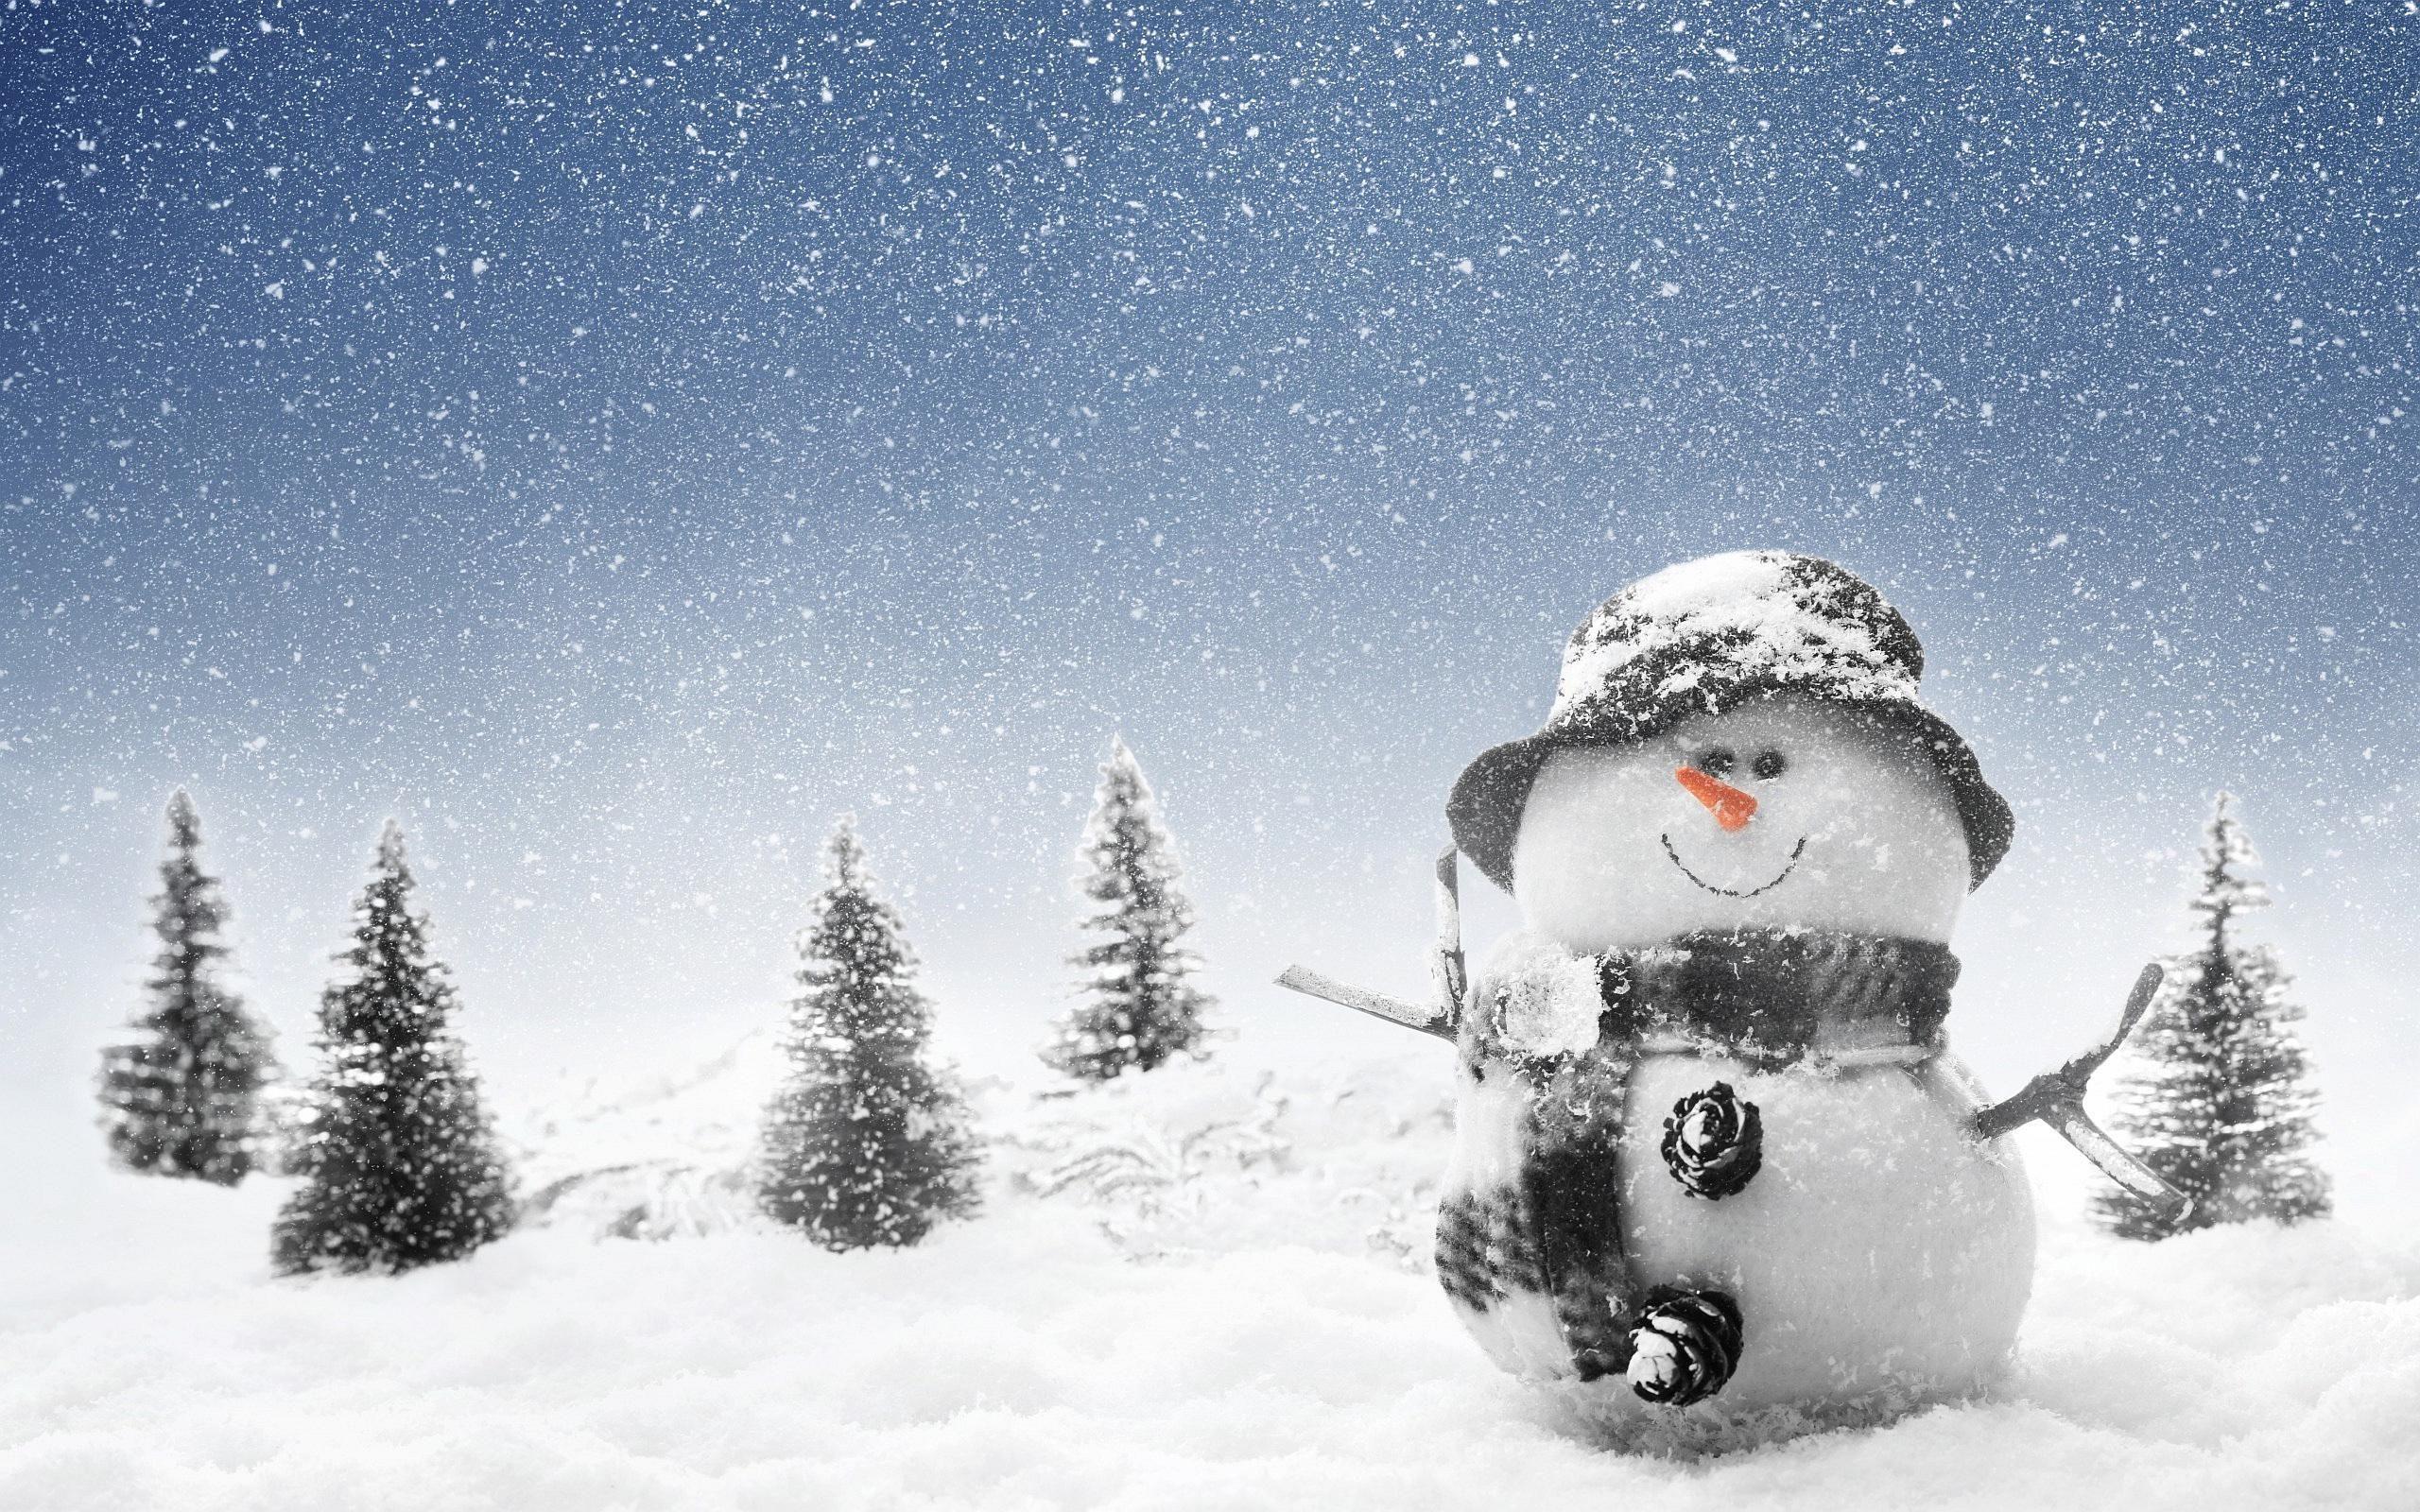 cool winter snowman wallpaper Χειμώνας, Κατασκευές